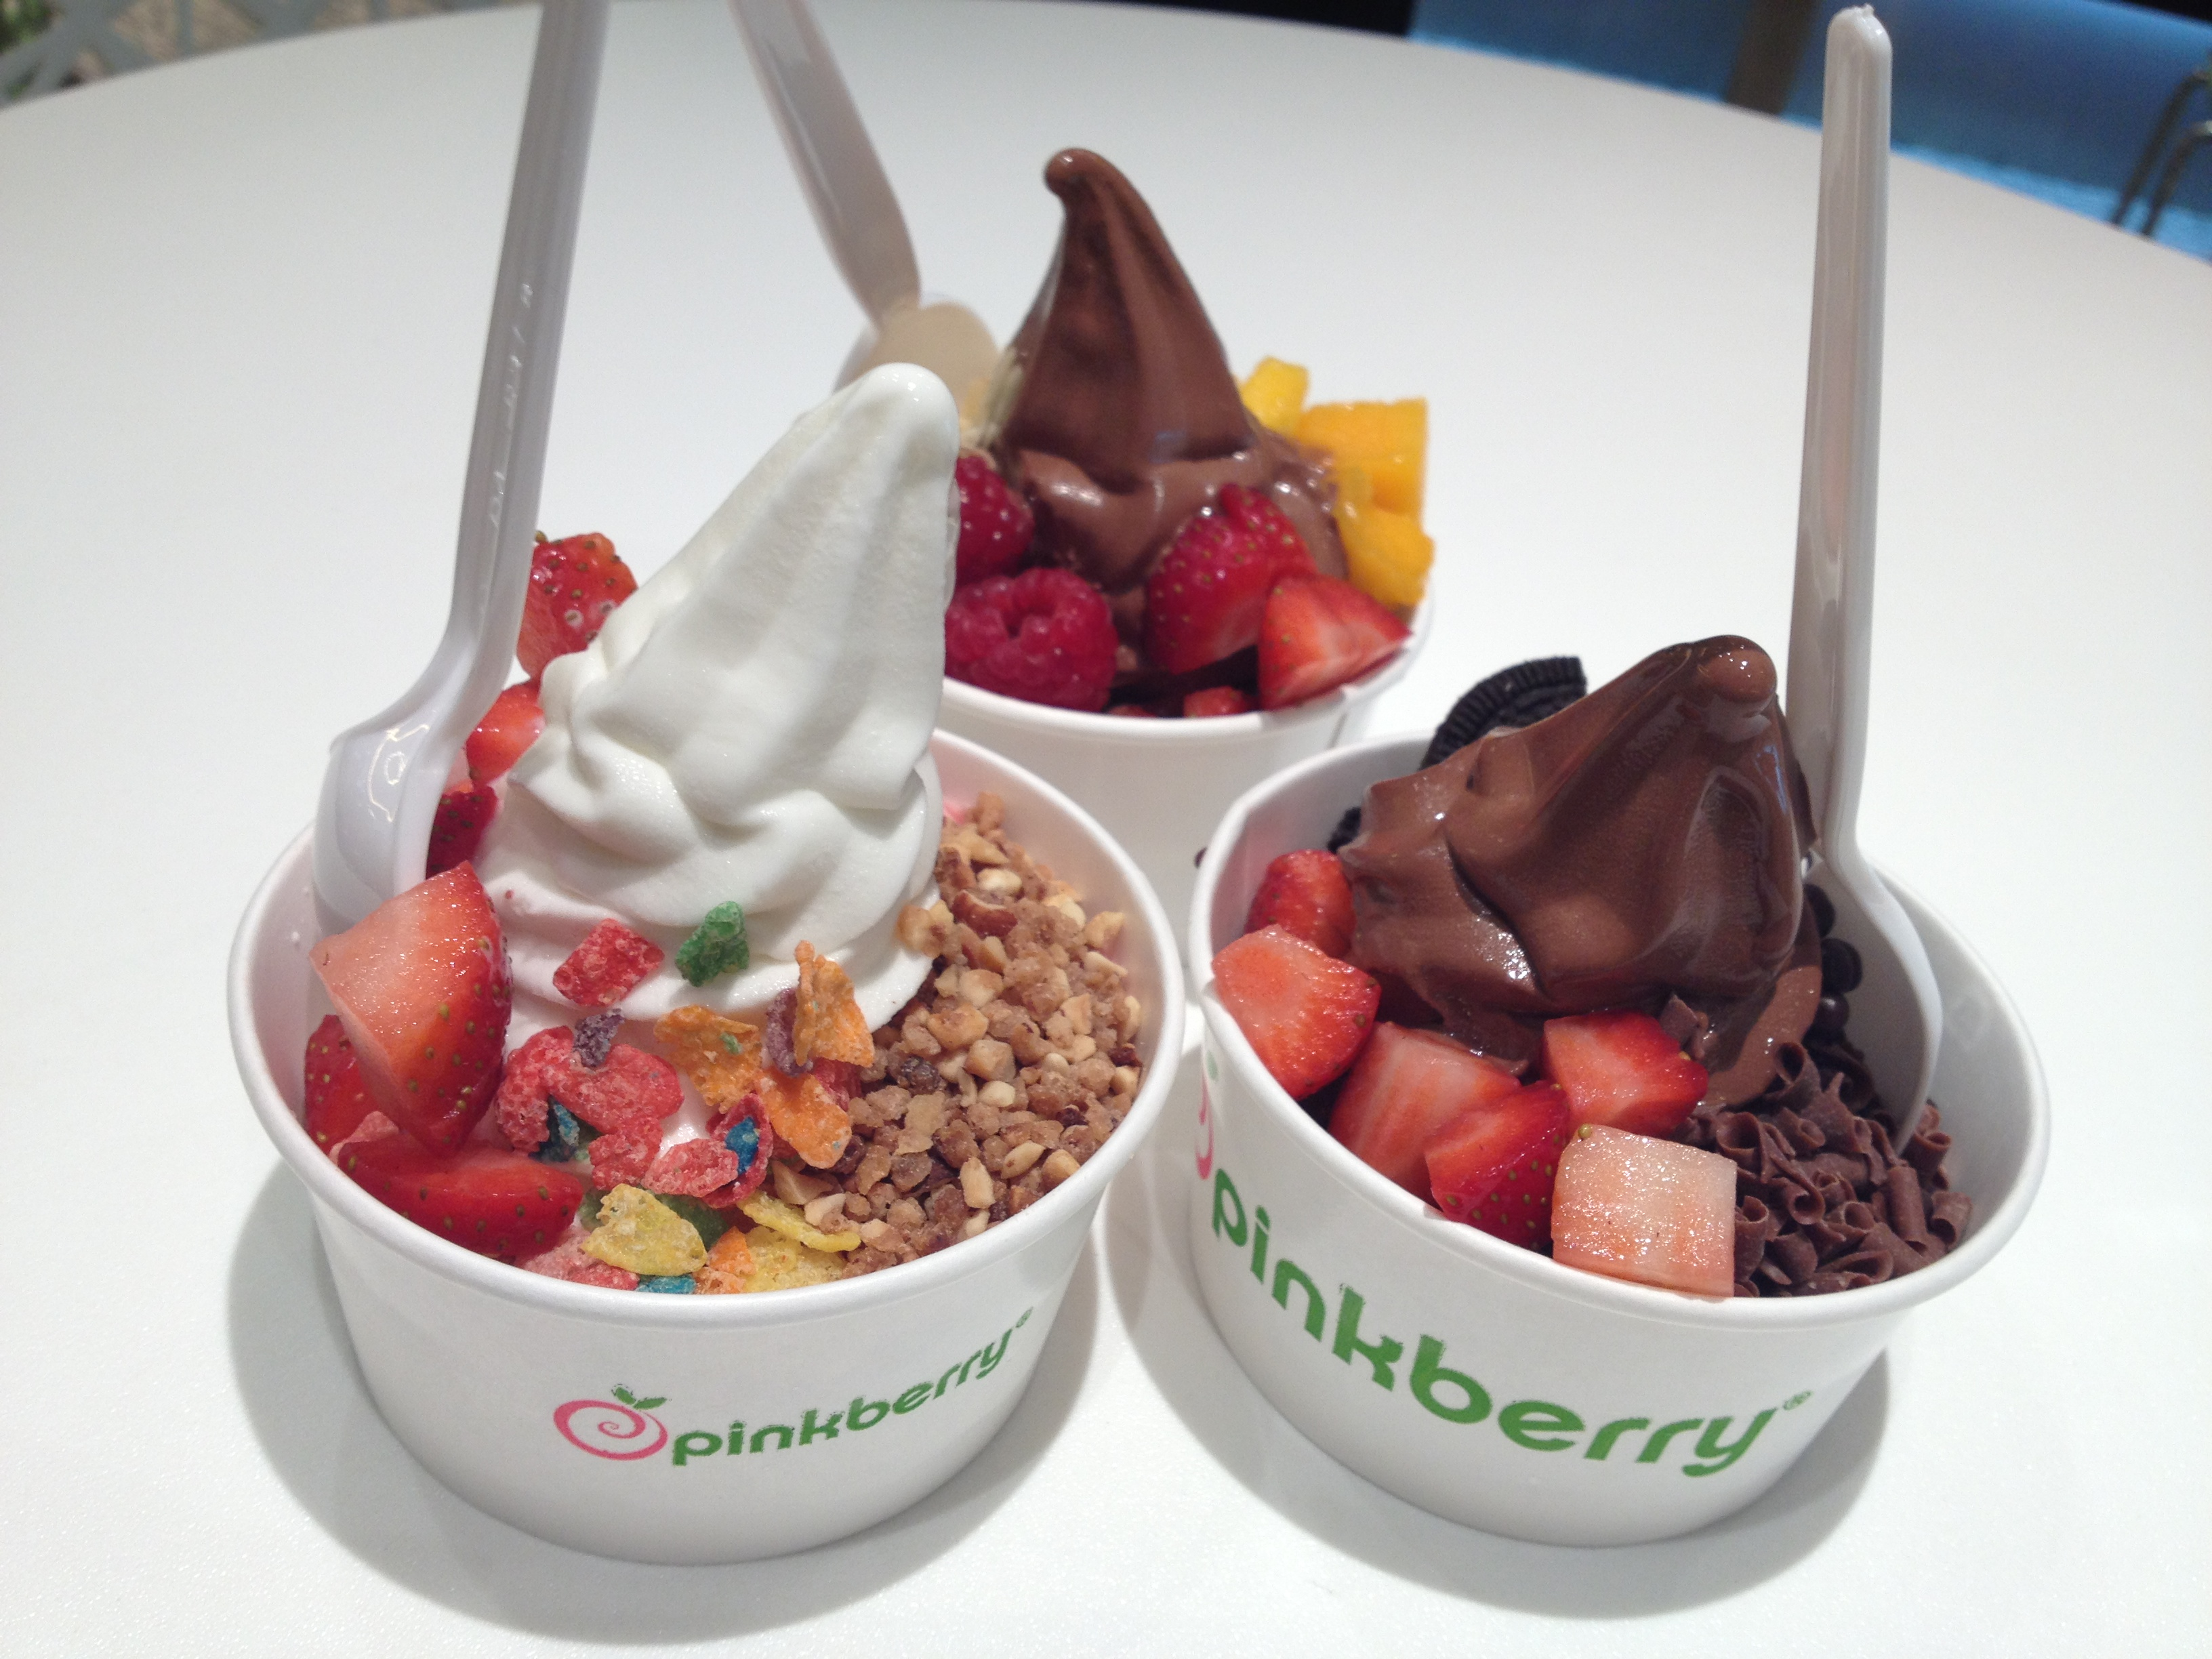 http://foodloader.net/Chu_2012-12-28_Pink_Berry_Icecream_Yogurt.jpg